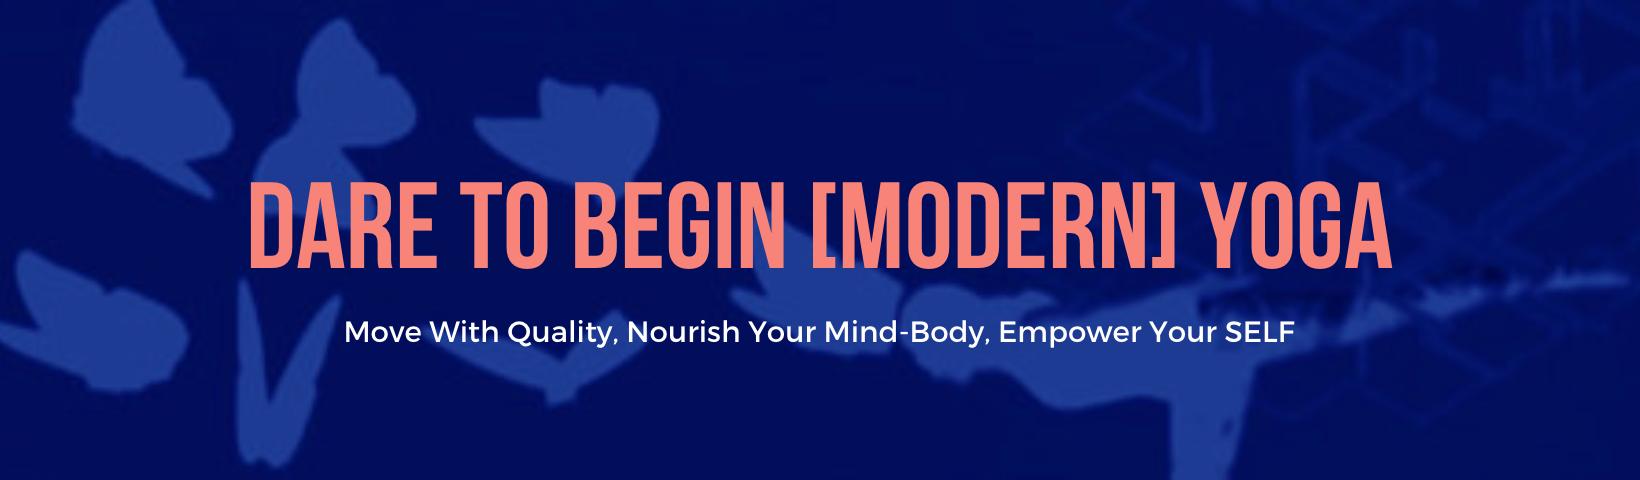 eagle pose, yoga for beginners, rogue yogi, rogue yoga, yoga at home, how to practice yoga, yoga for weight loss, deep house yoga, underground yoga, urban yoga, meditation, guided meditation